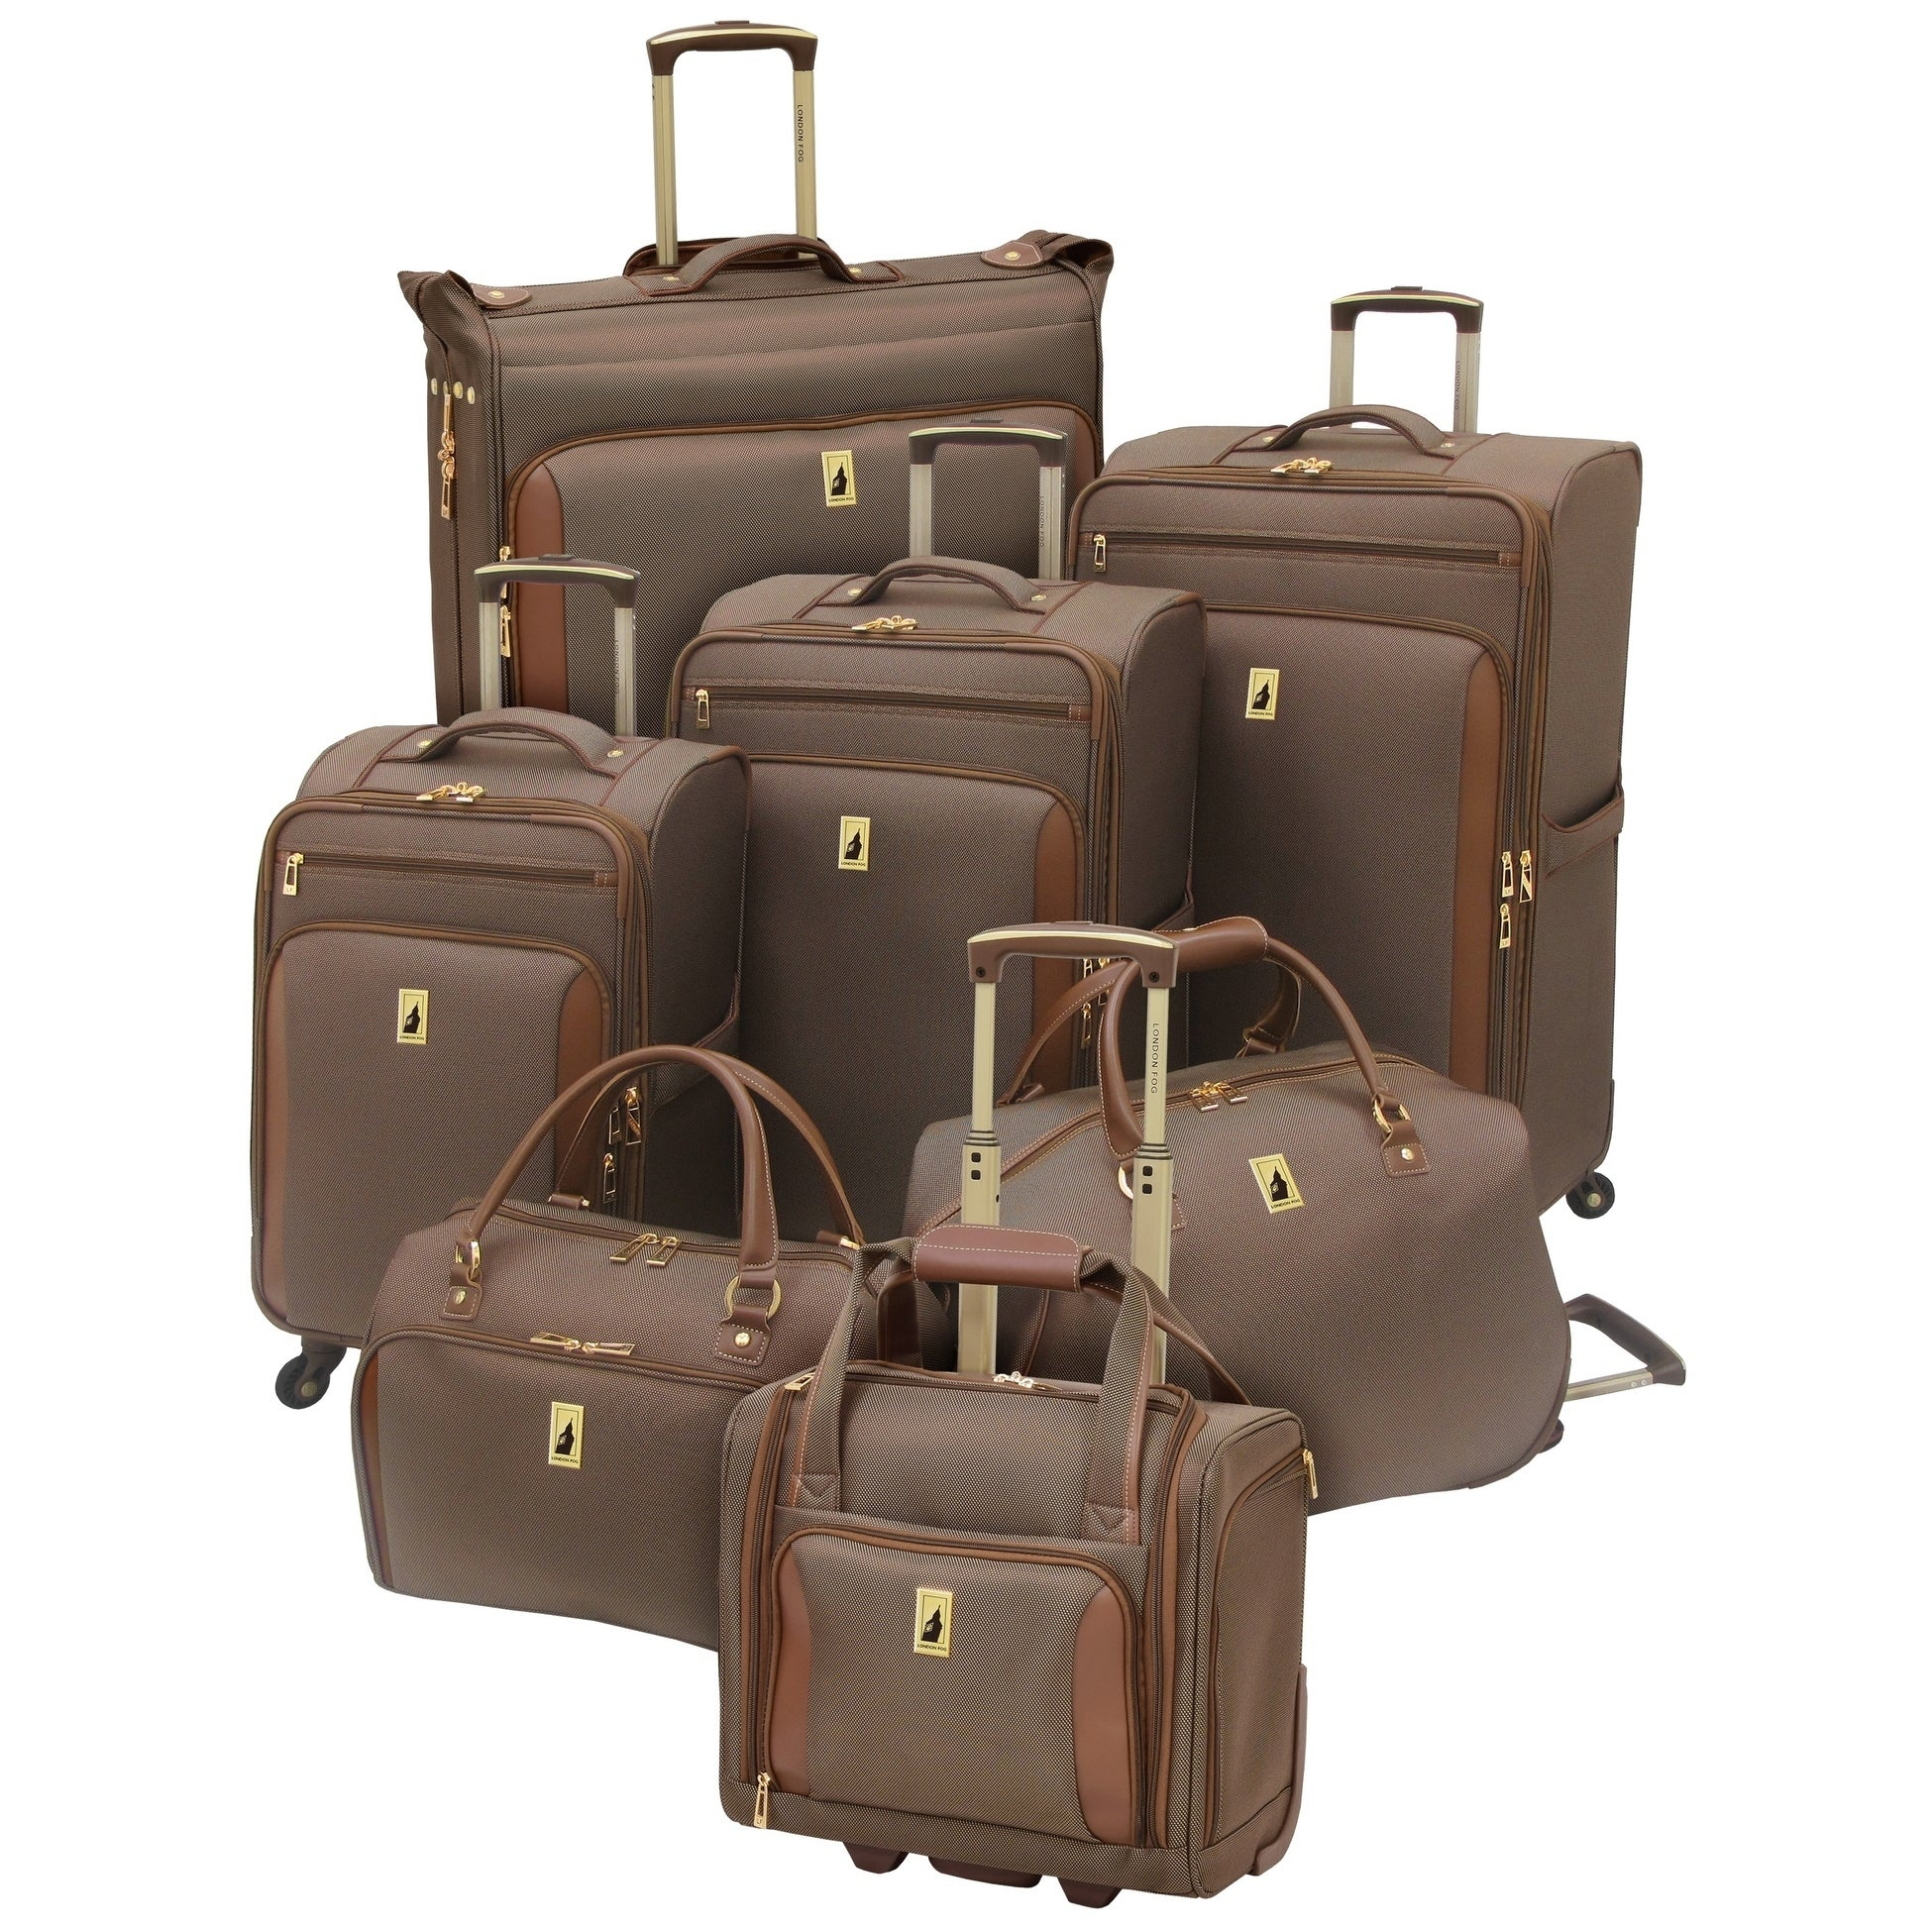 London Fog Kensington 44 Wheeled Garment Bag Free Shipping Today 17624158